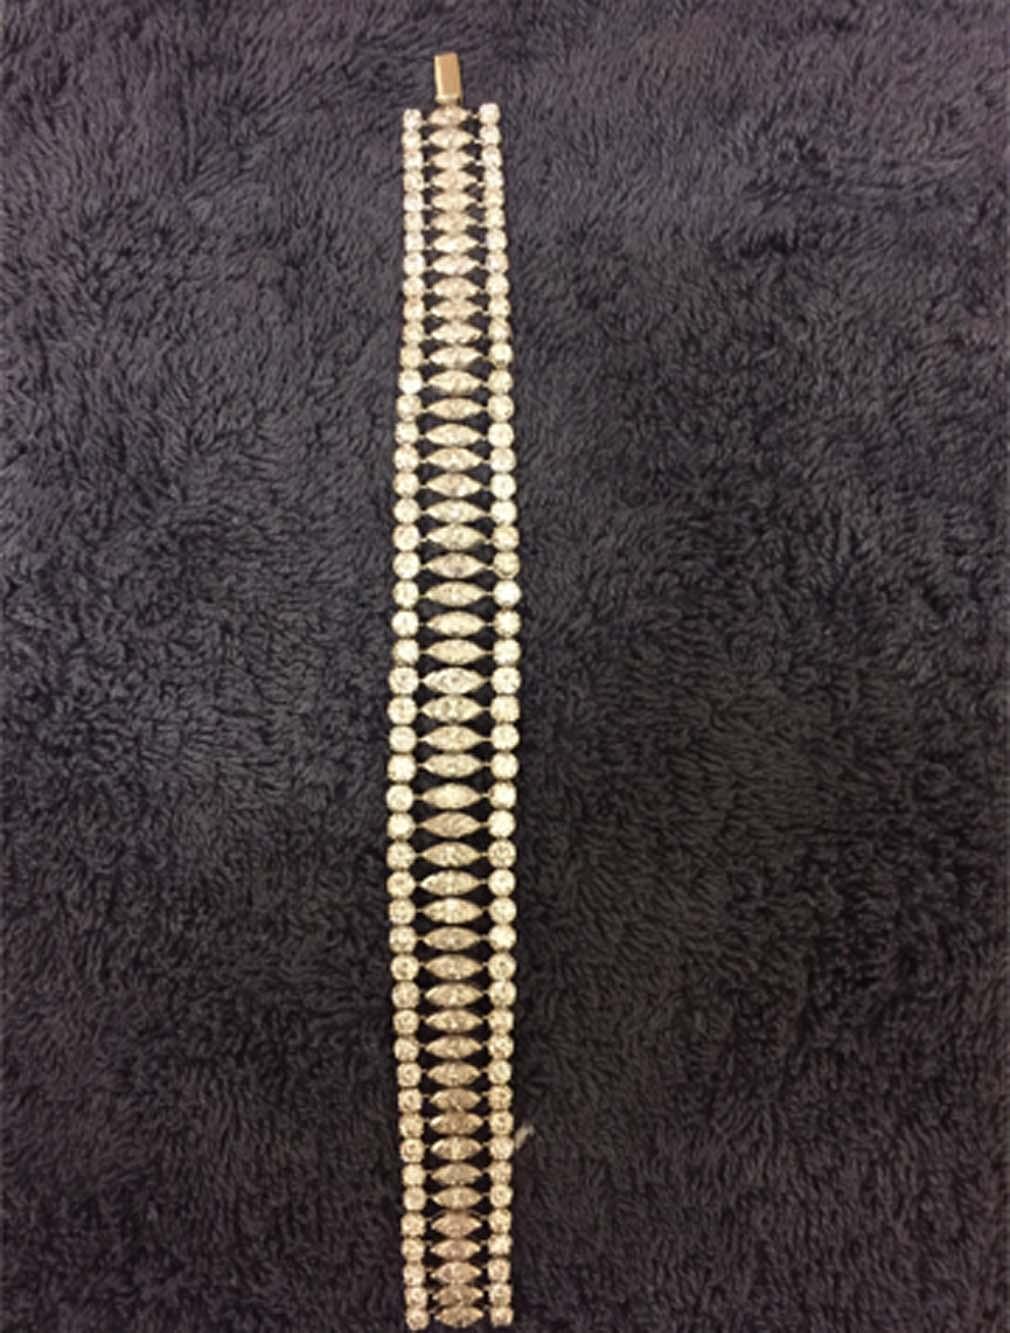 Narukvica bijelo zlato 40g, 30.4ct dijamanata